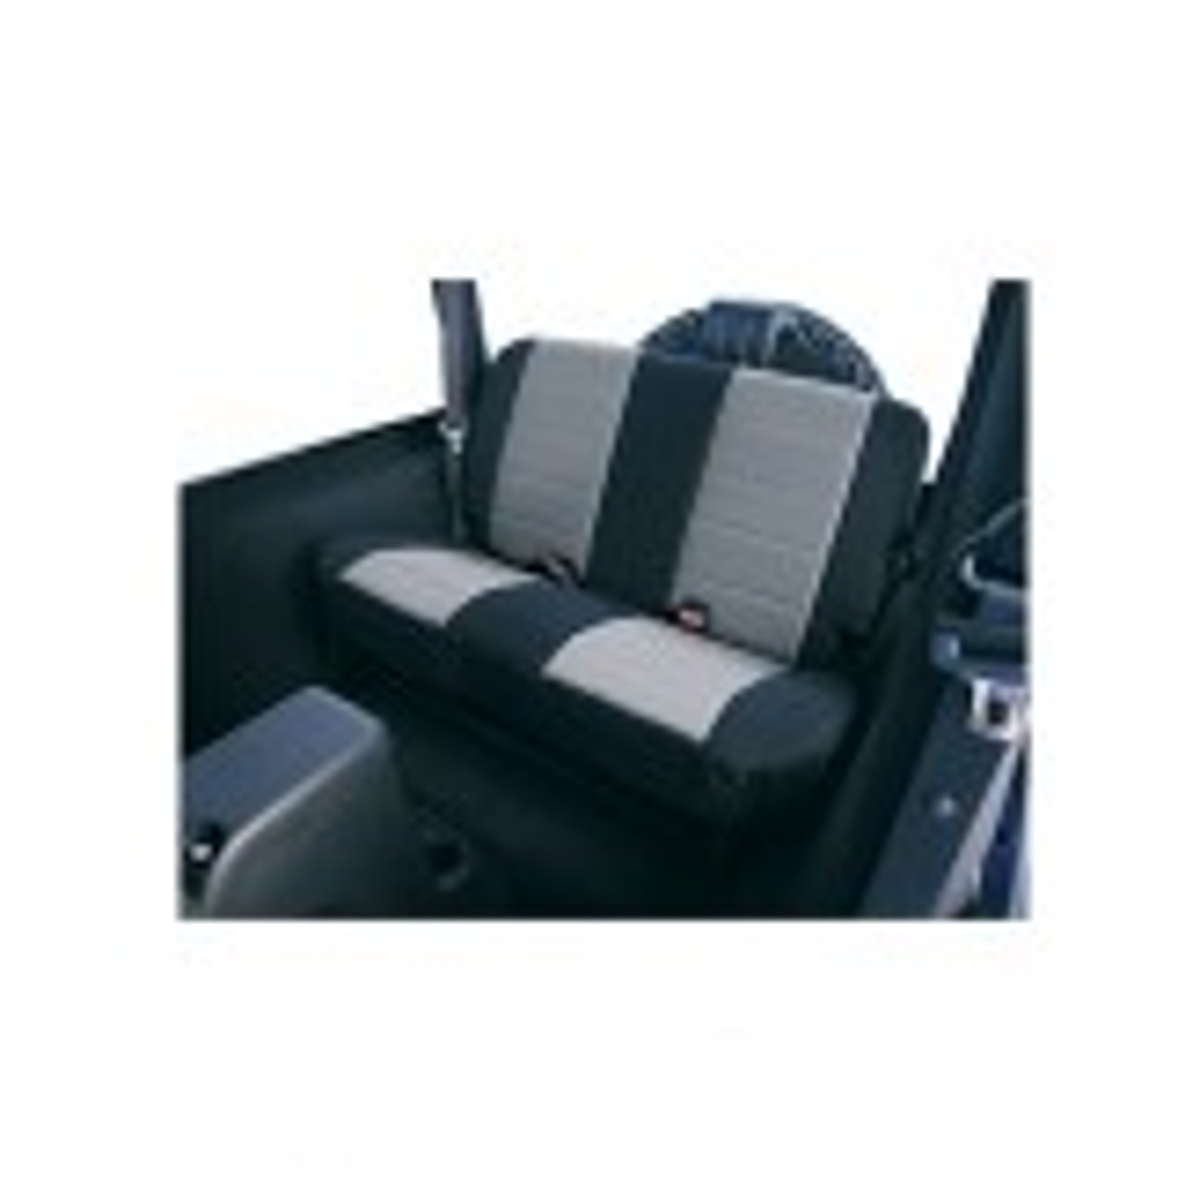 Fabric Rear Seat Covers, Gray; 97-02 Jeep Wrangler TJ